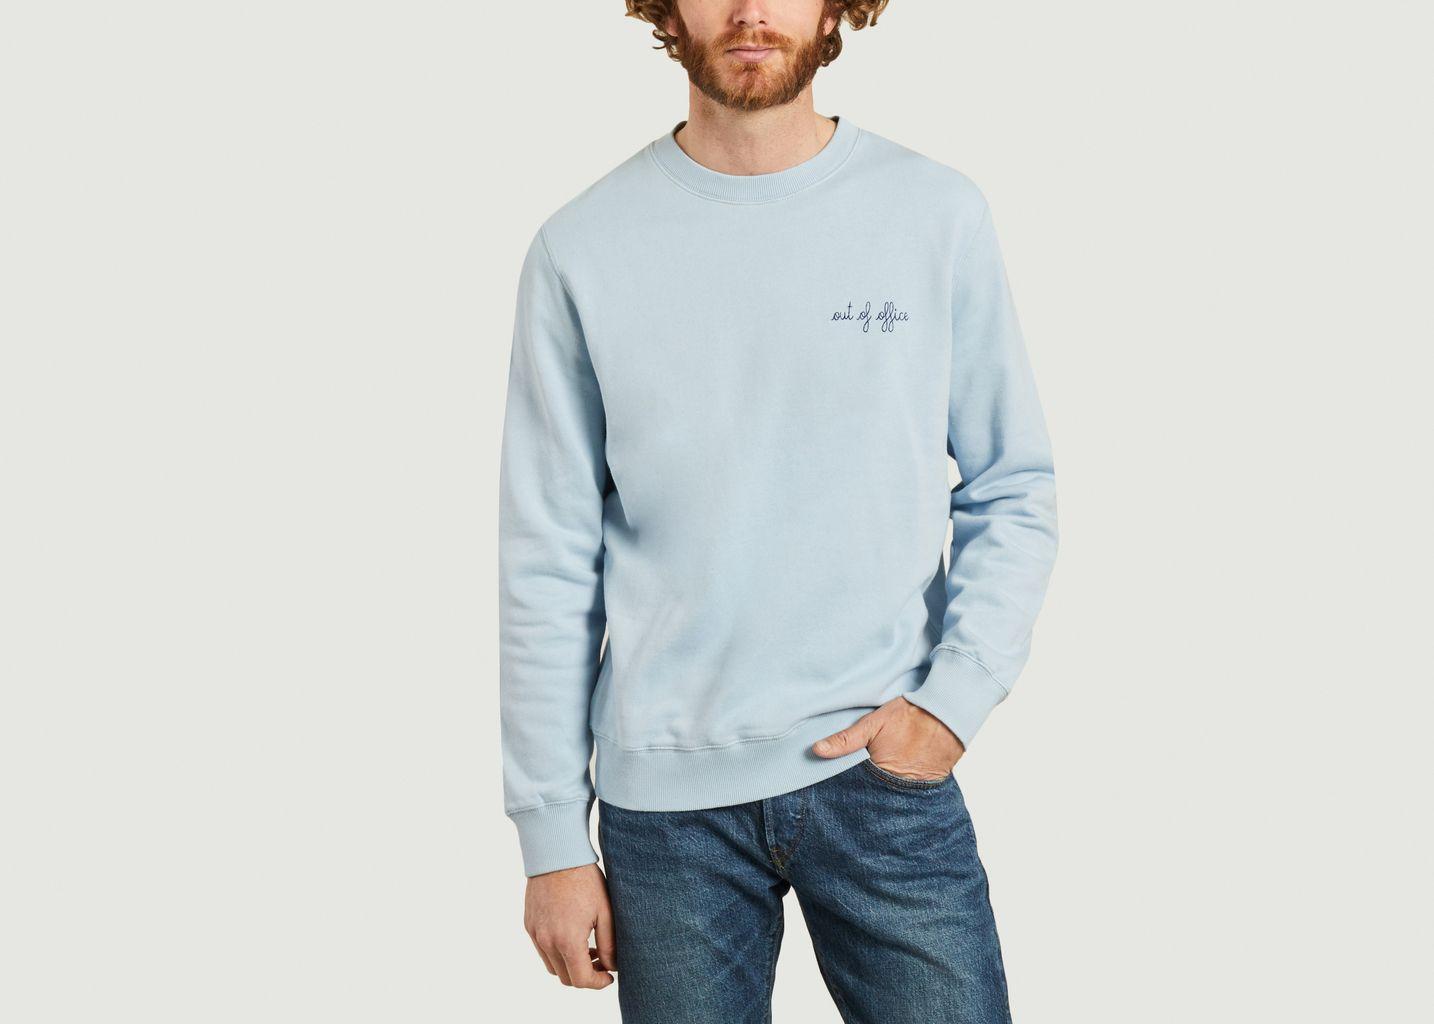 Sweatshirt Out of Office - Maison Labiche